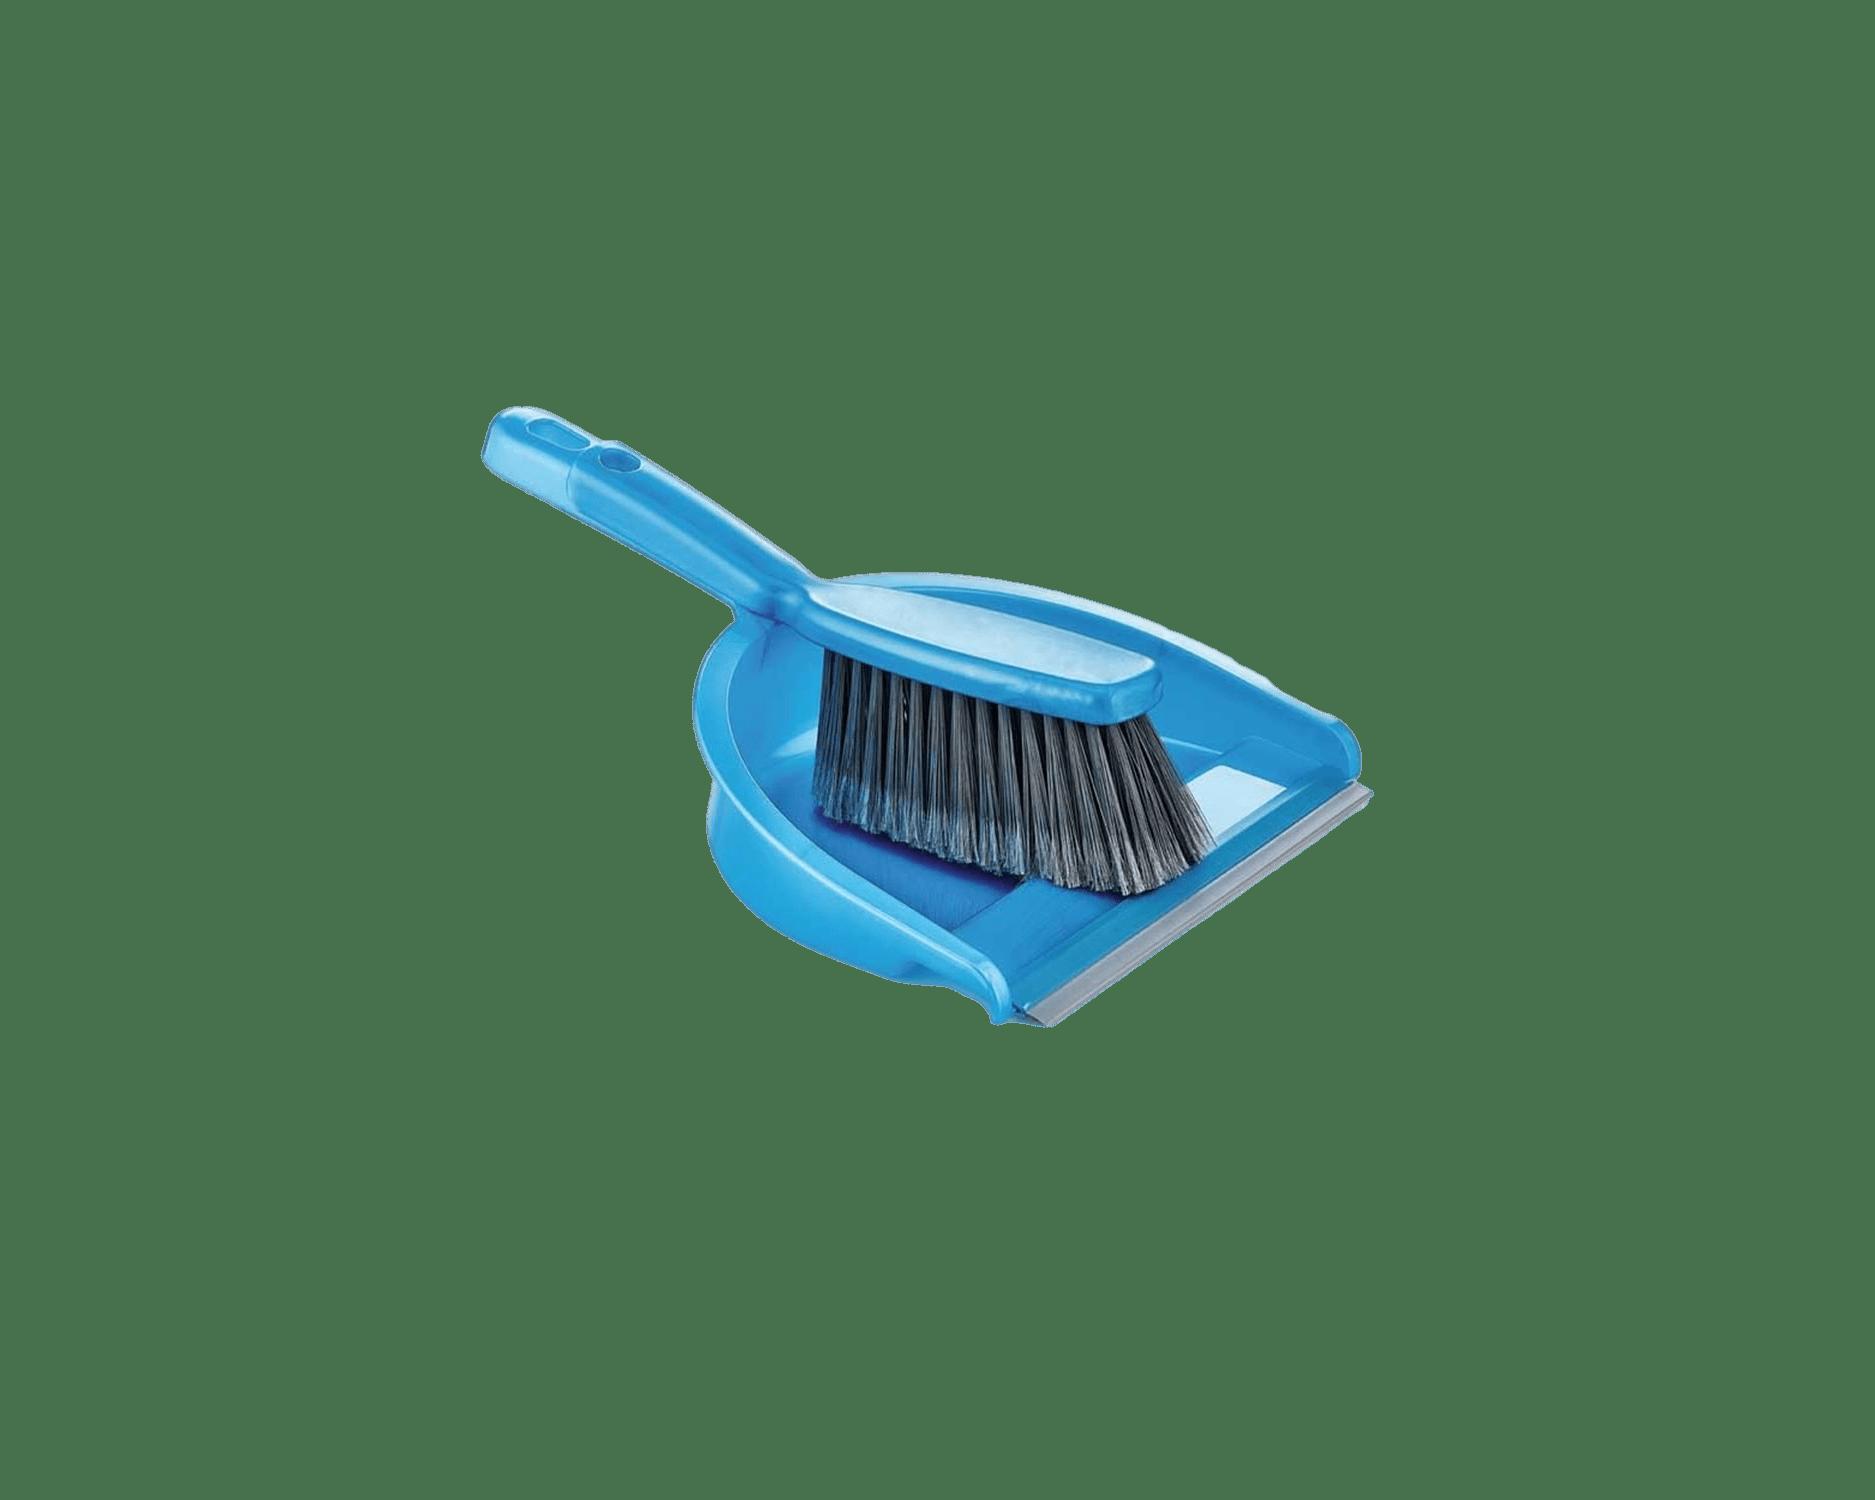 brush and dustpan blue